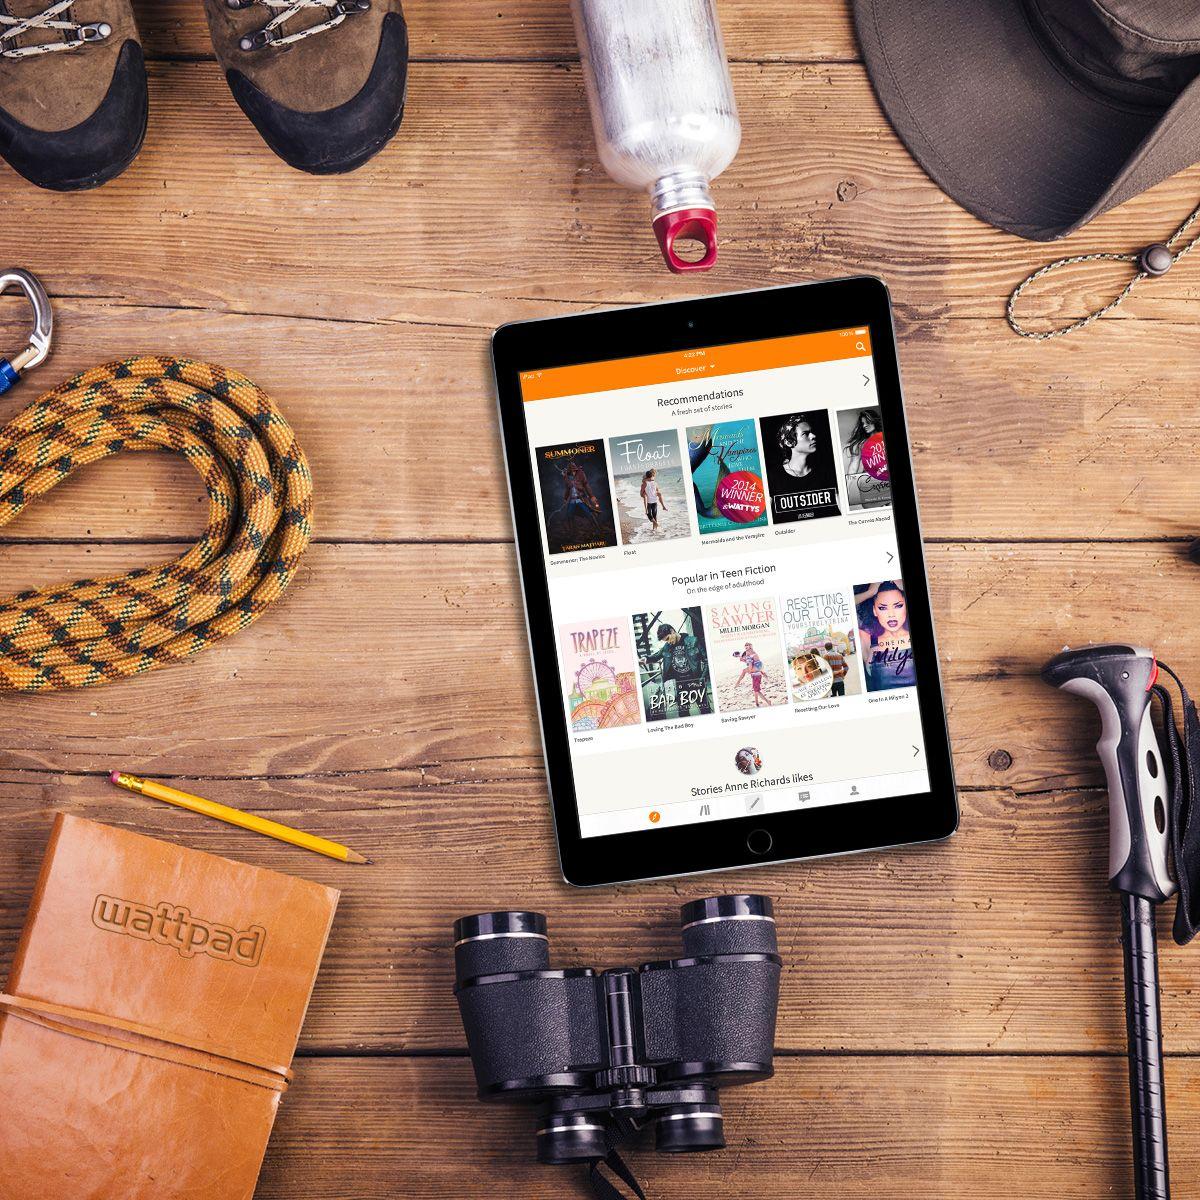 Get lost in a must-read adventure story on Wattpad this week.